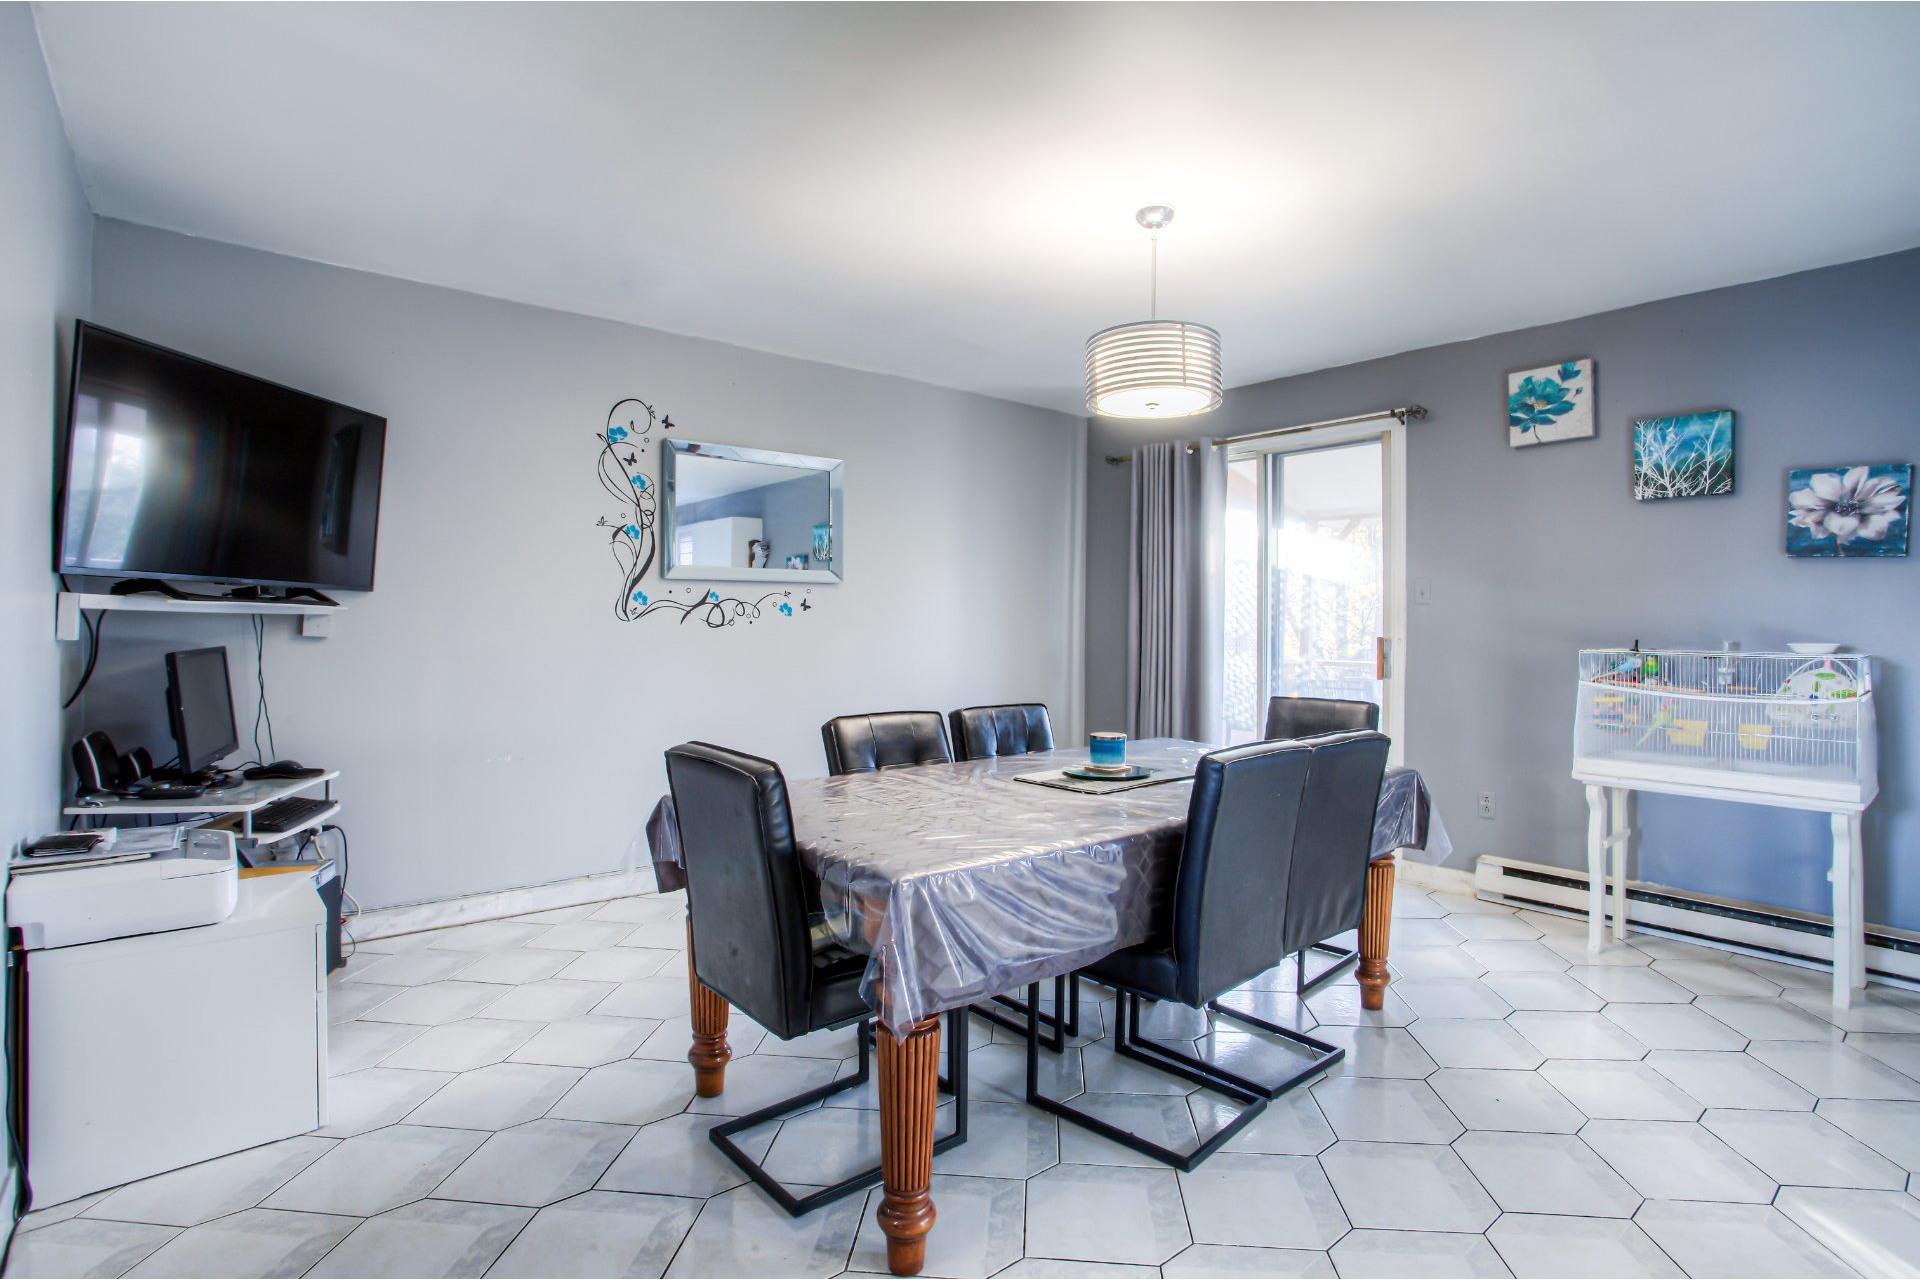 image 7 - House For sale Pierrefonds-Roxboro Montréal  - 8 rooms